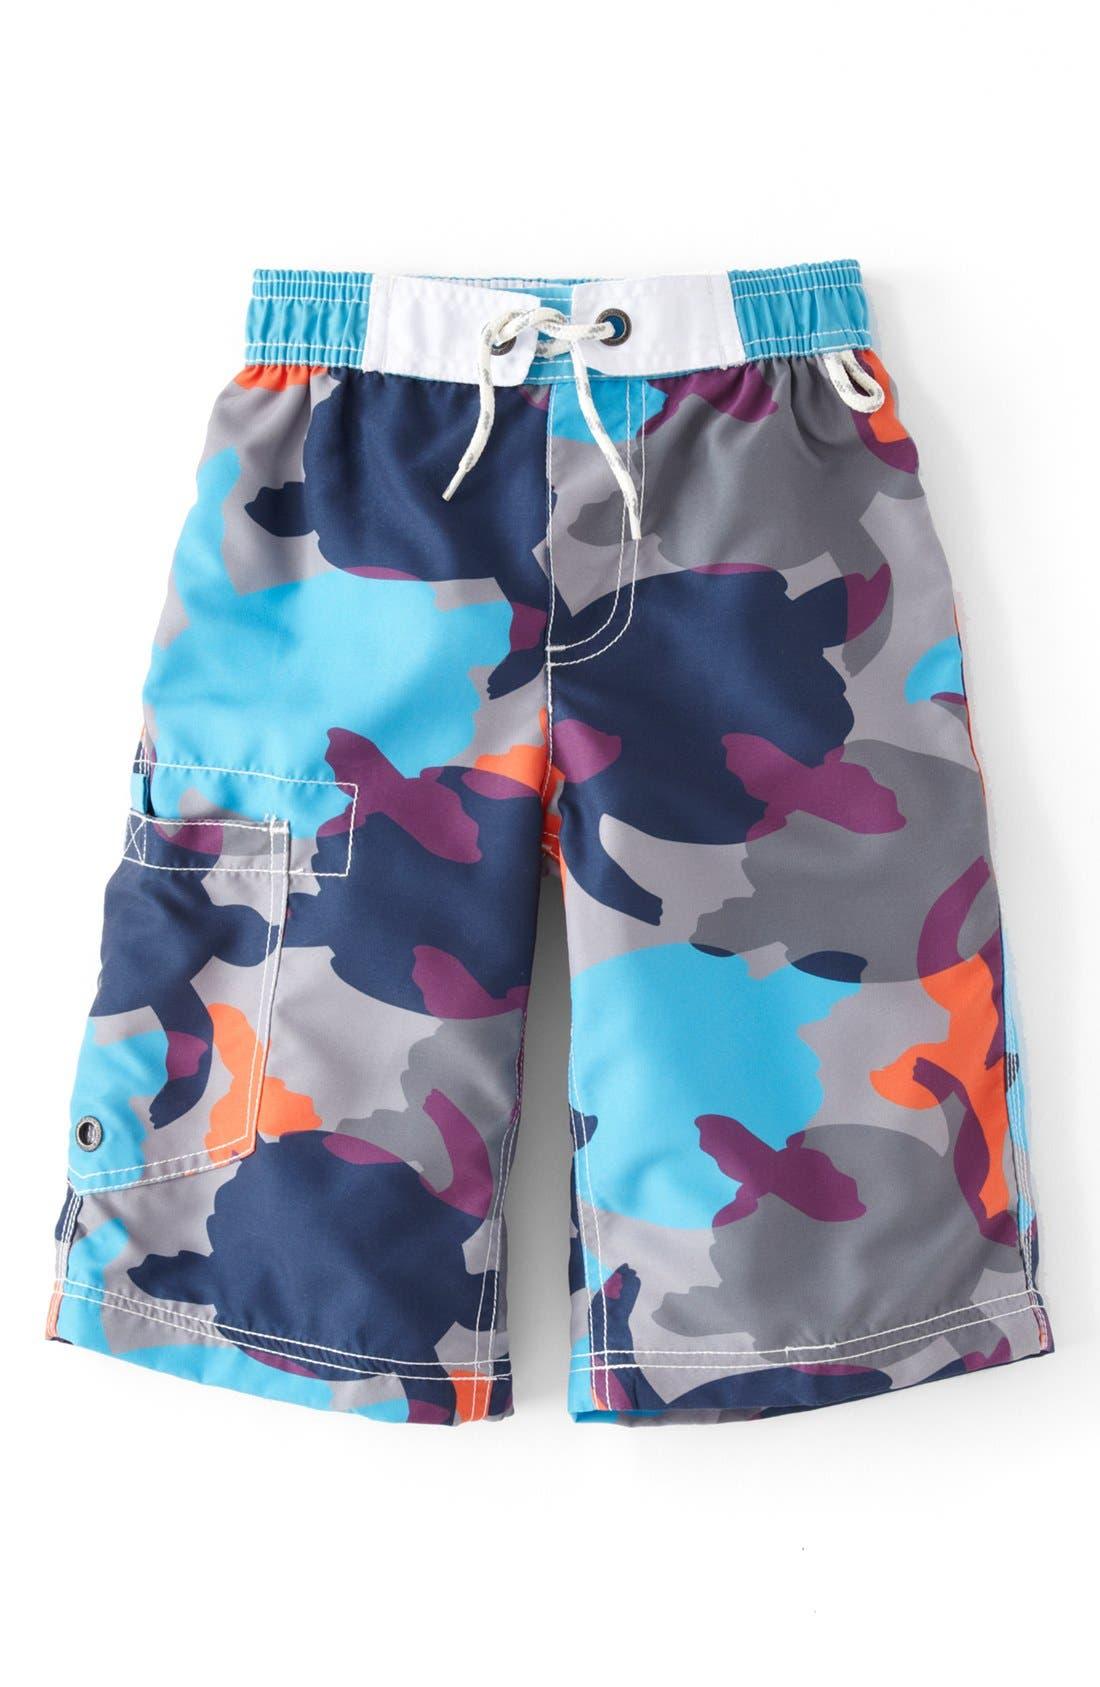 Alternate Image 1 Selected - Mini Boden 'Surf' Shorts (Toddler Boys, Little Boys & Big Boys)